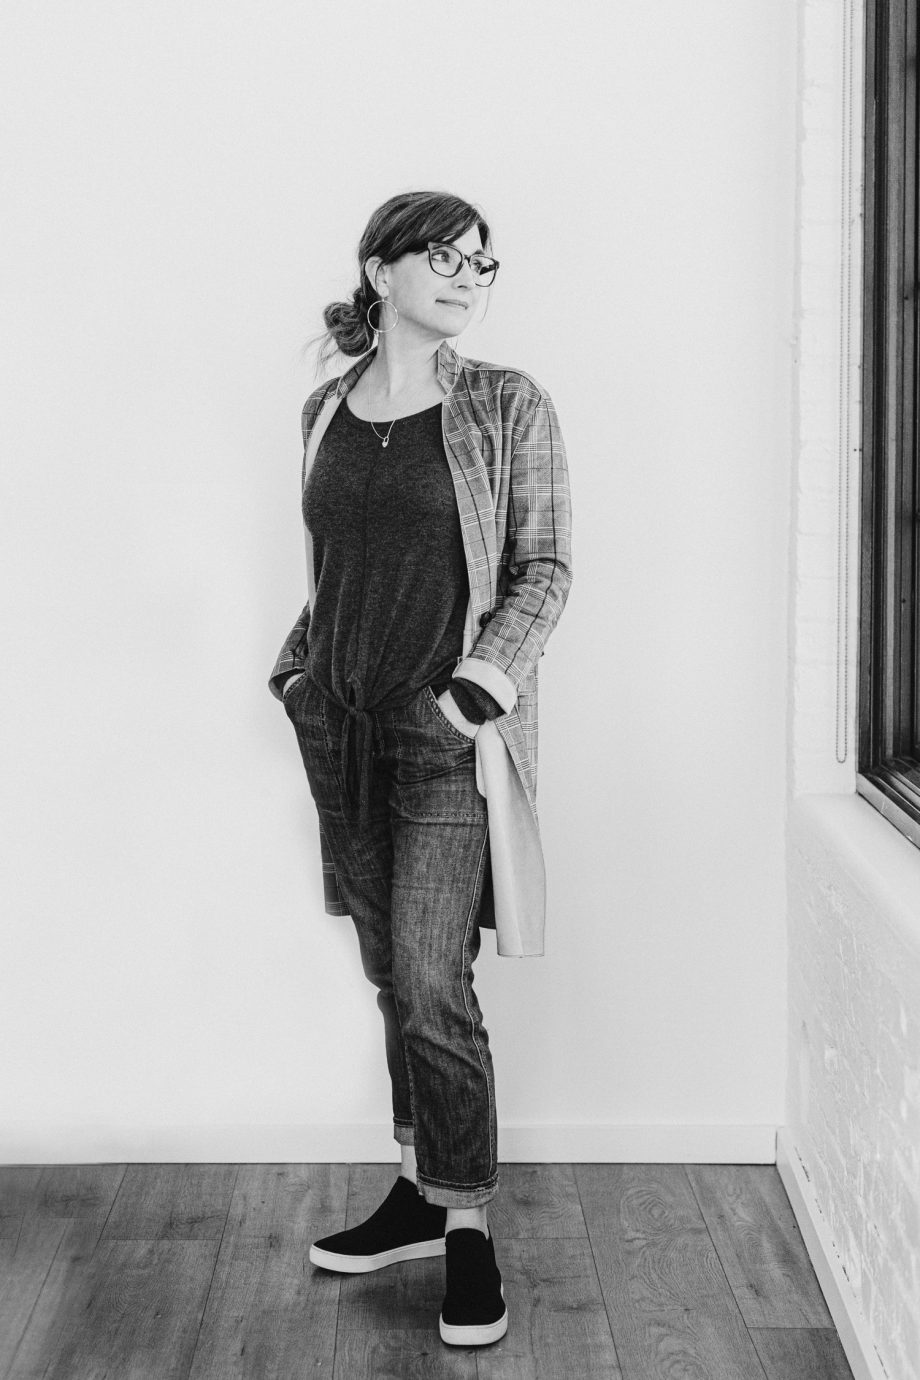 Carrie Minns, Portland, Oregon, photographer